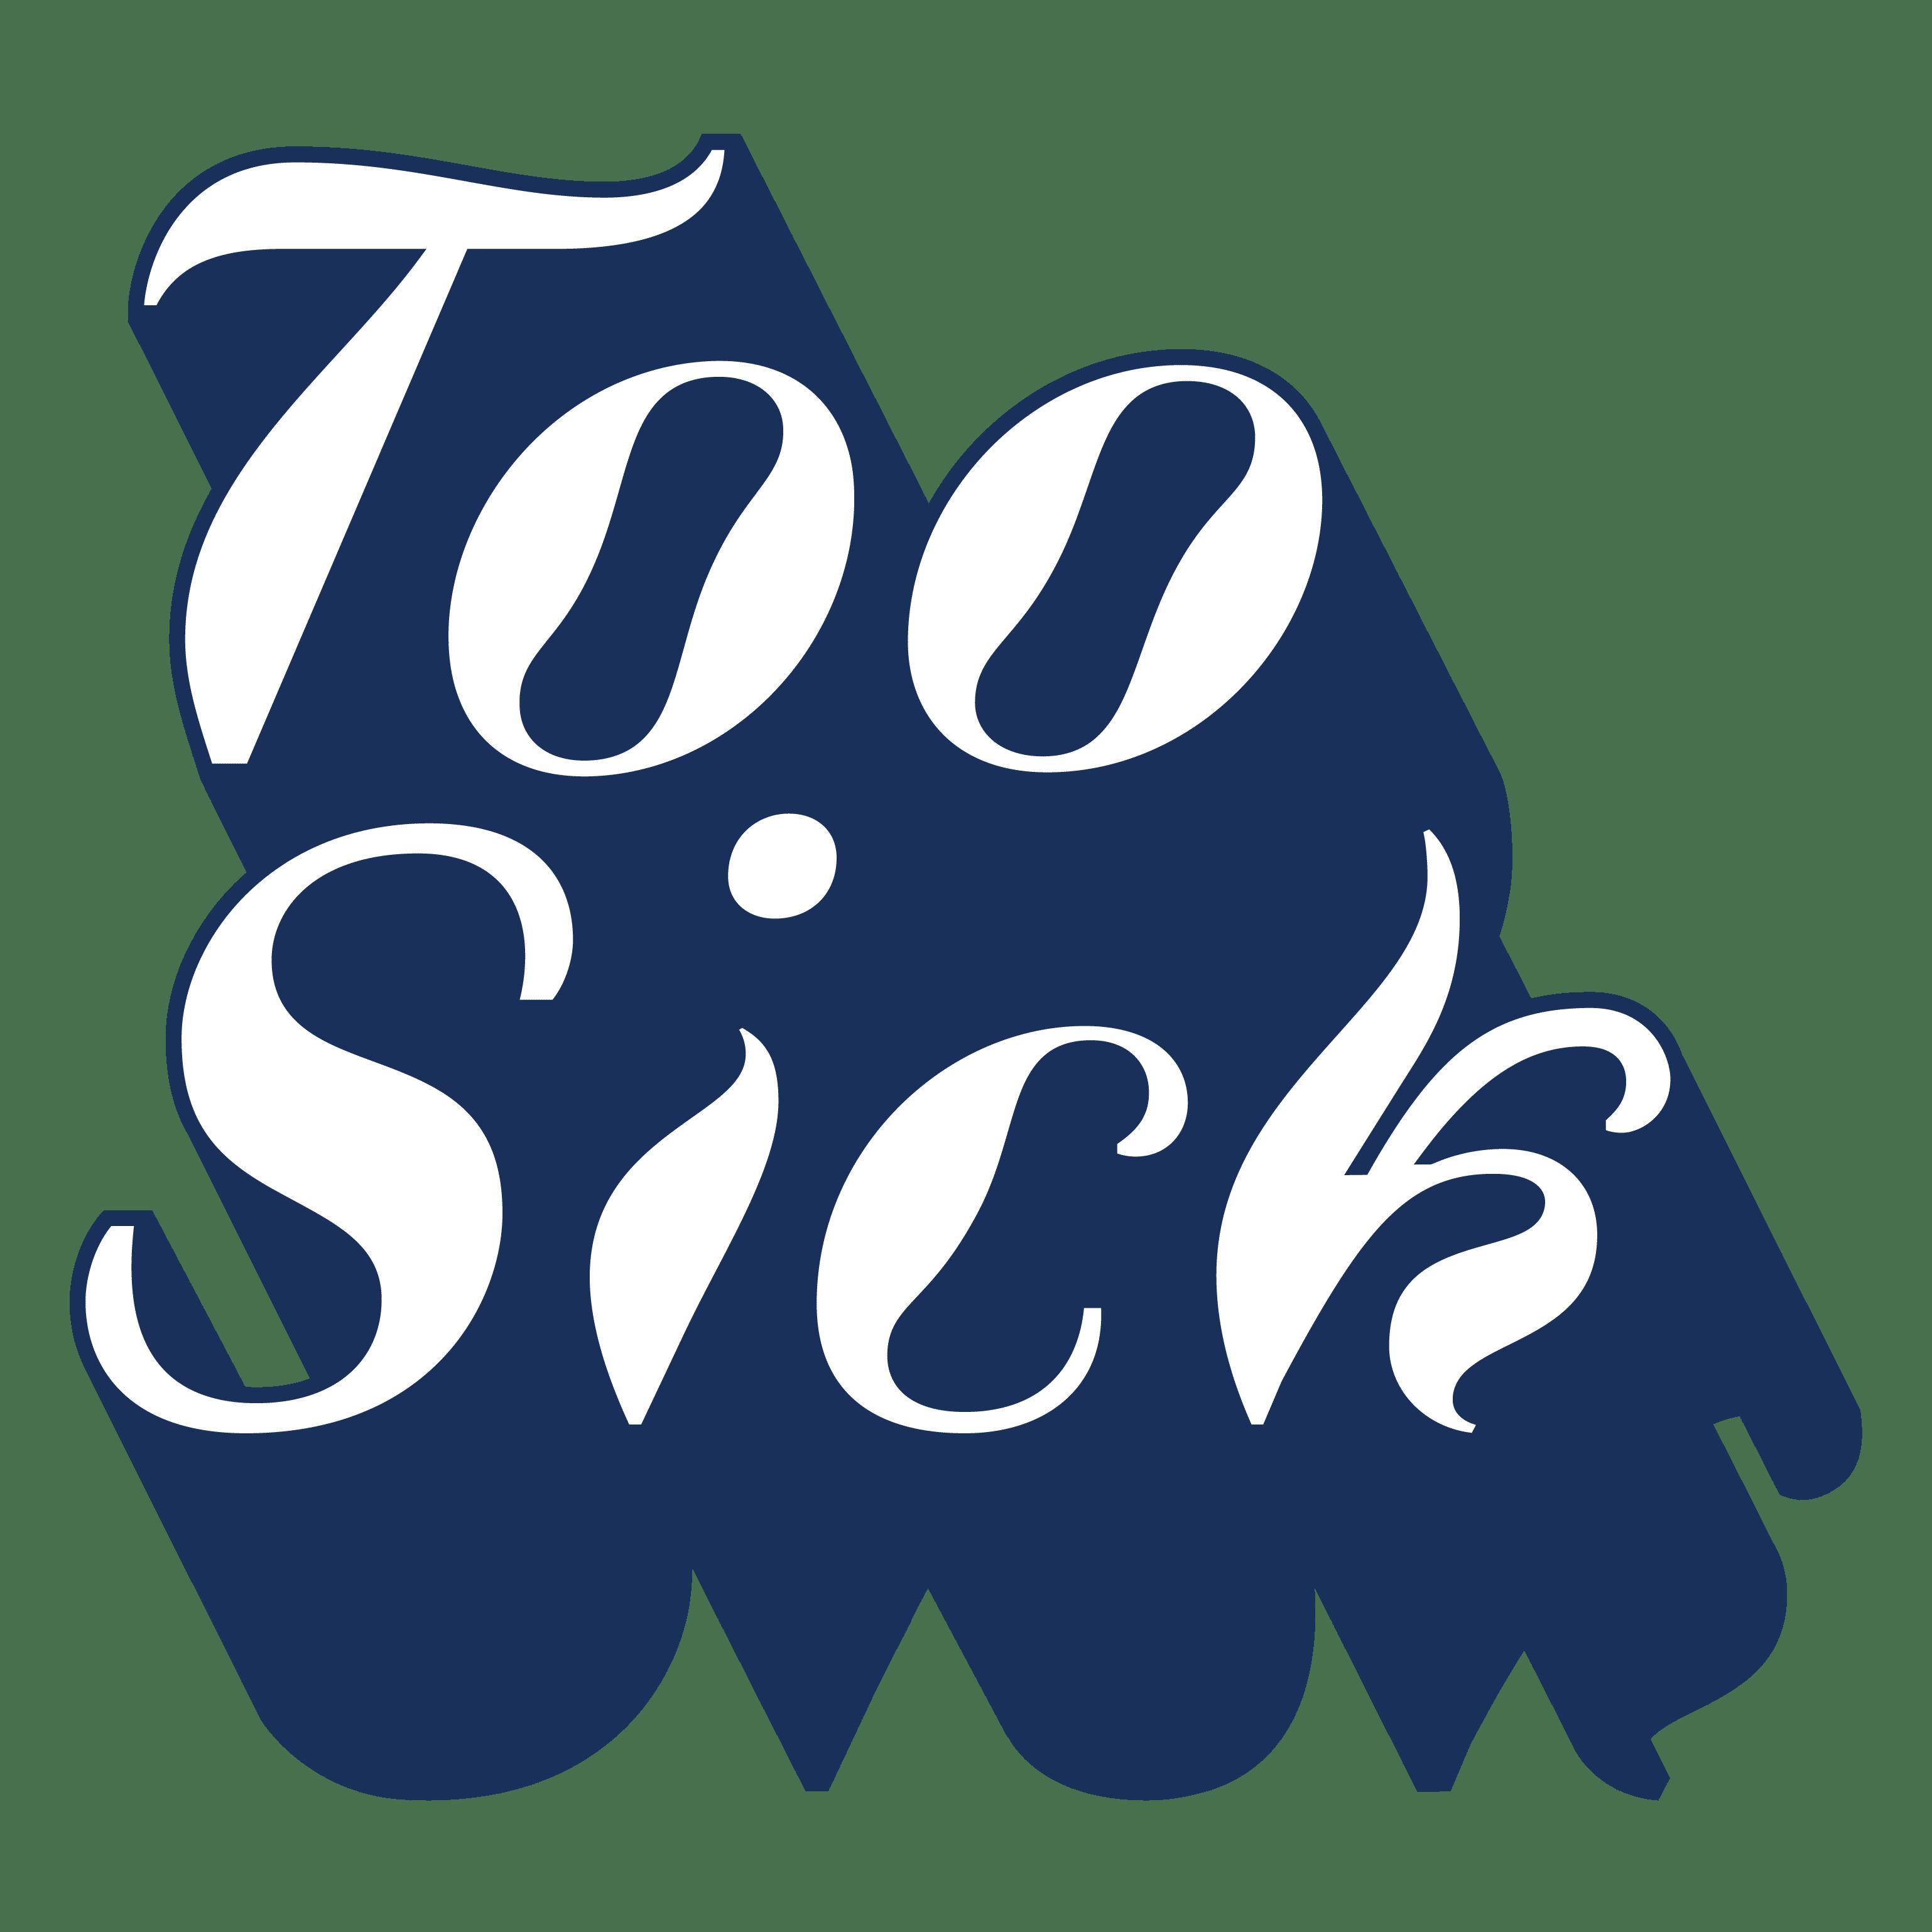 Too Sick logo